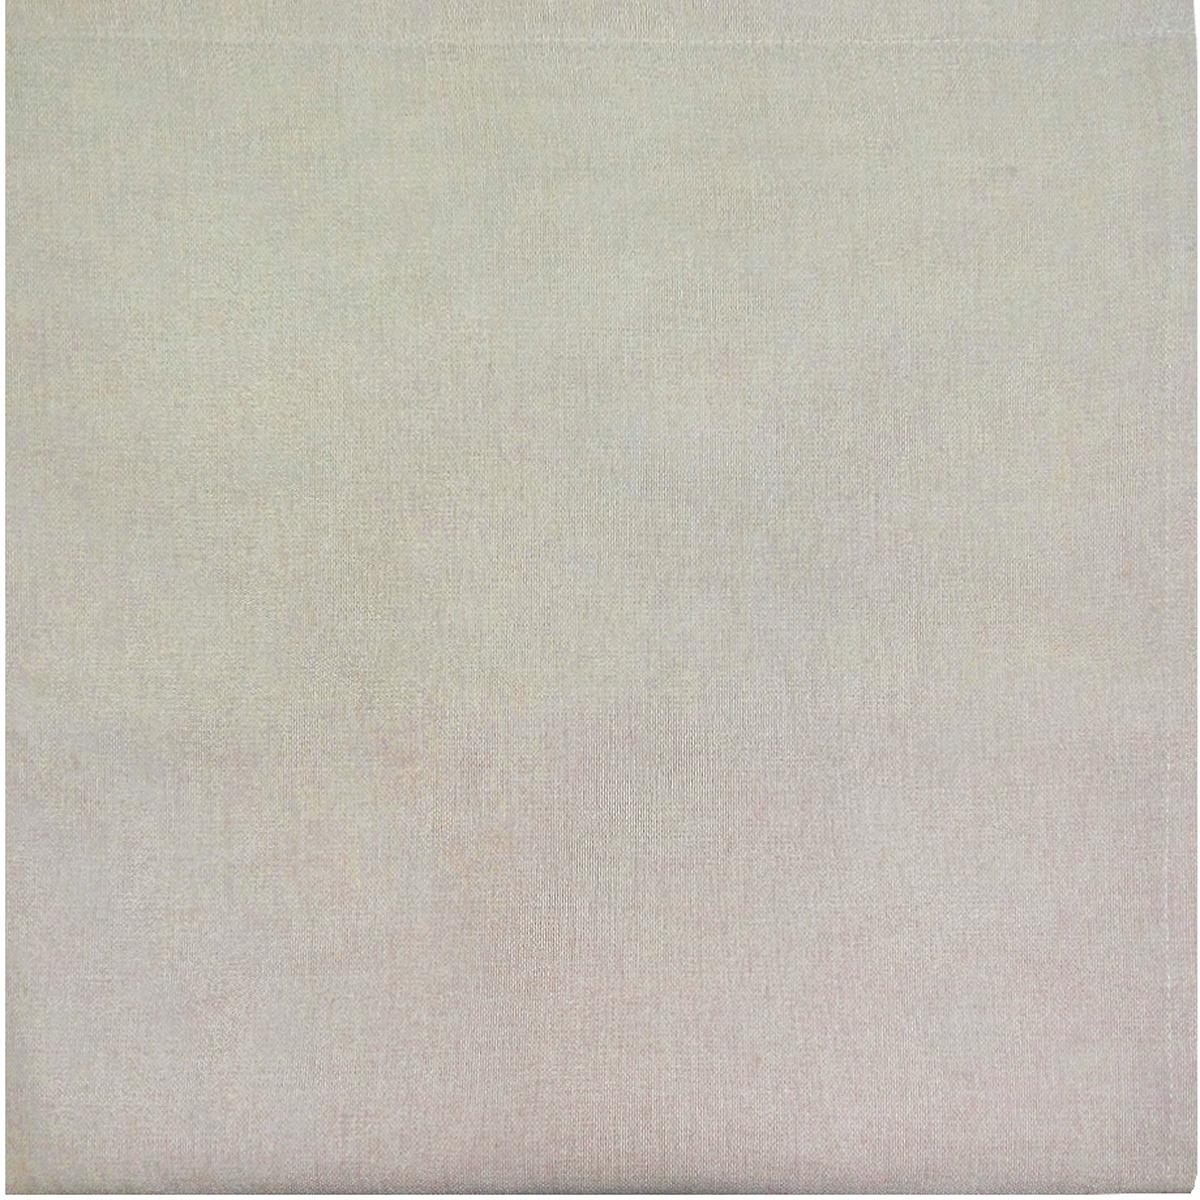 Дорожка на стол Altali, цвет: бежевый, 40 х 140 см